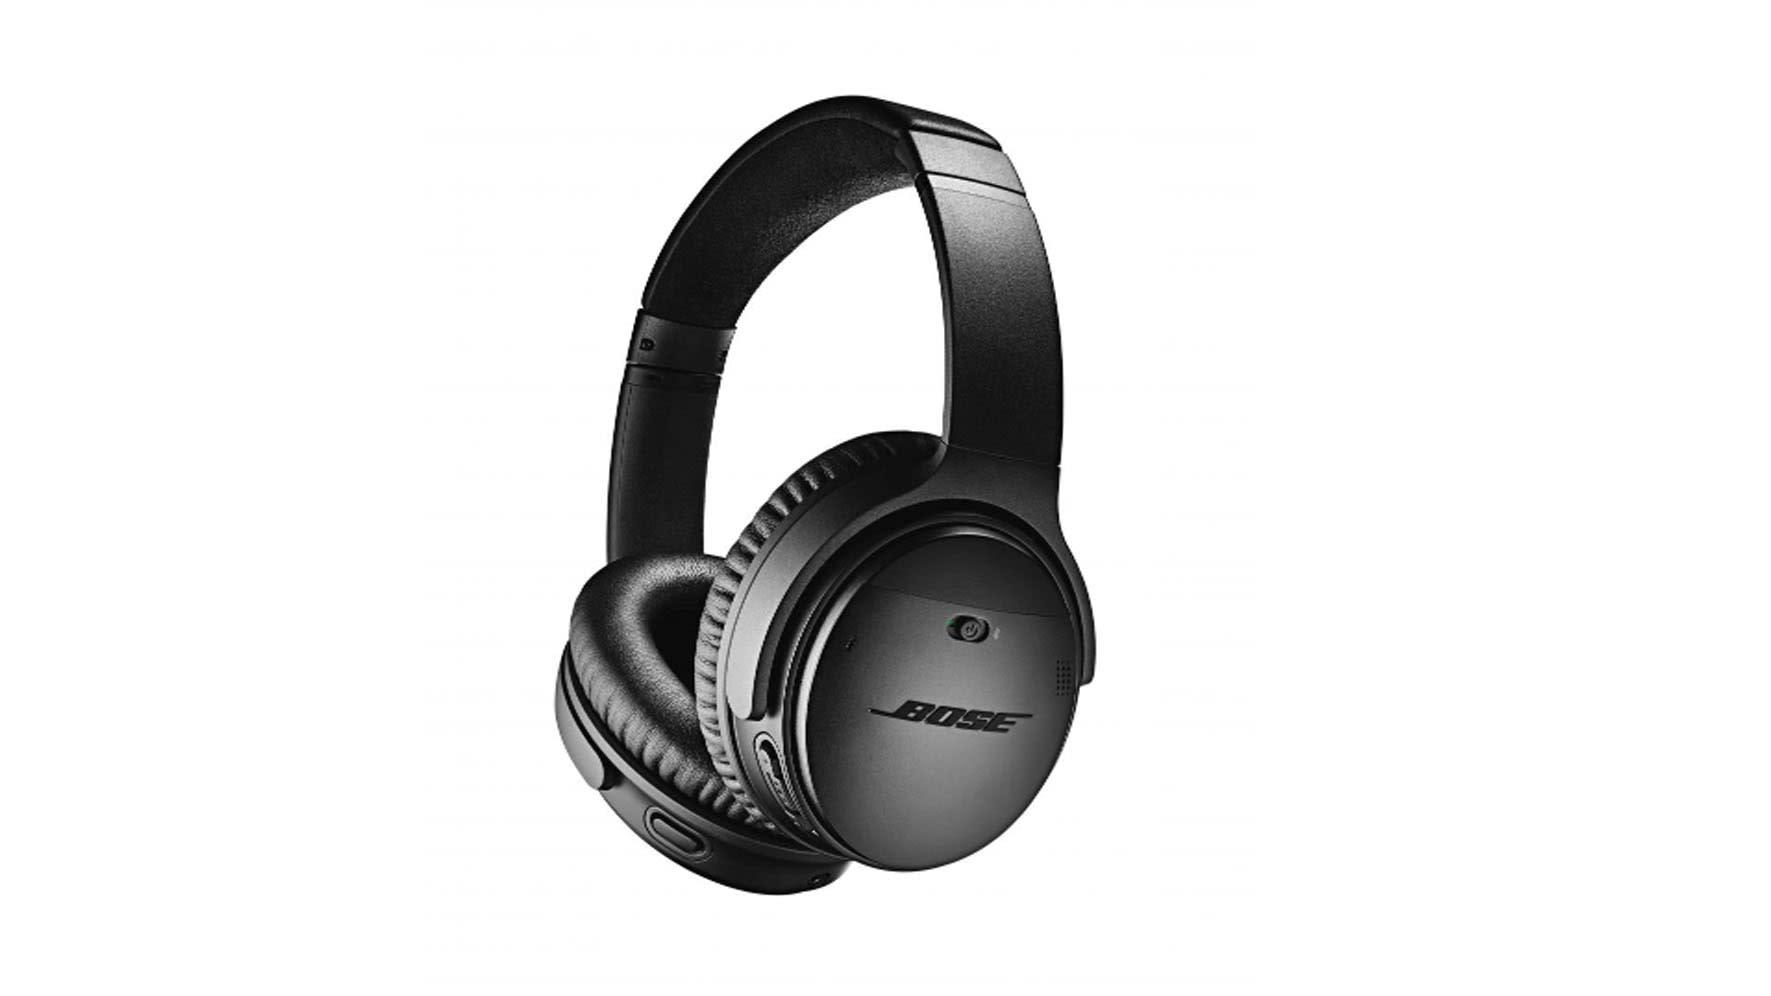 Bose QC35 II 無線耳機讓Mad Team能隨時專注的利用片段時間自我訓練或投入安靜的世界裡以音樂舒緩身心。(圖源:Mad Team)